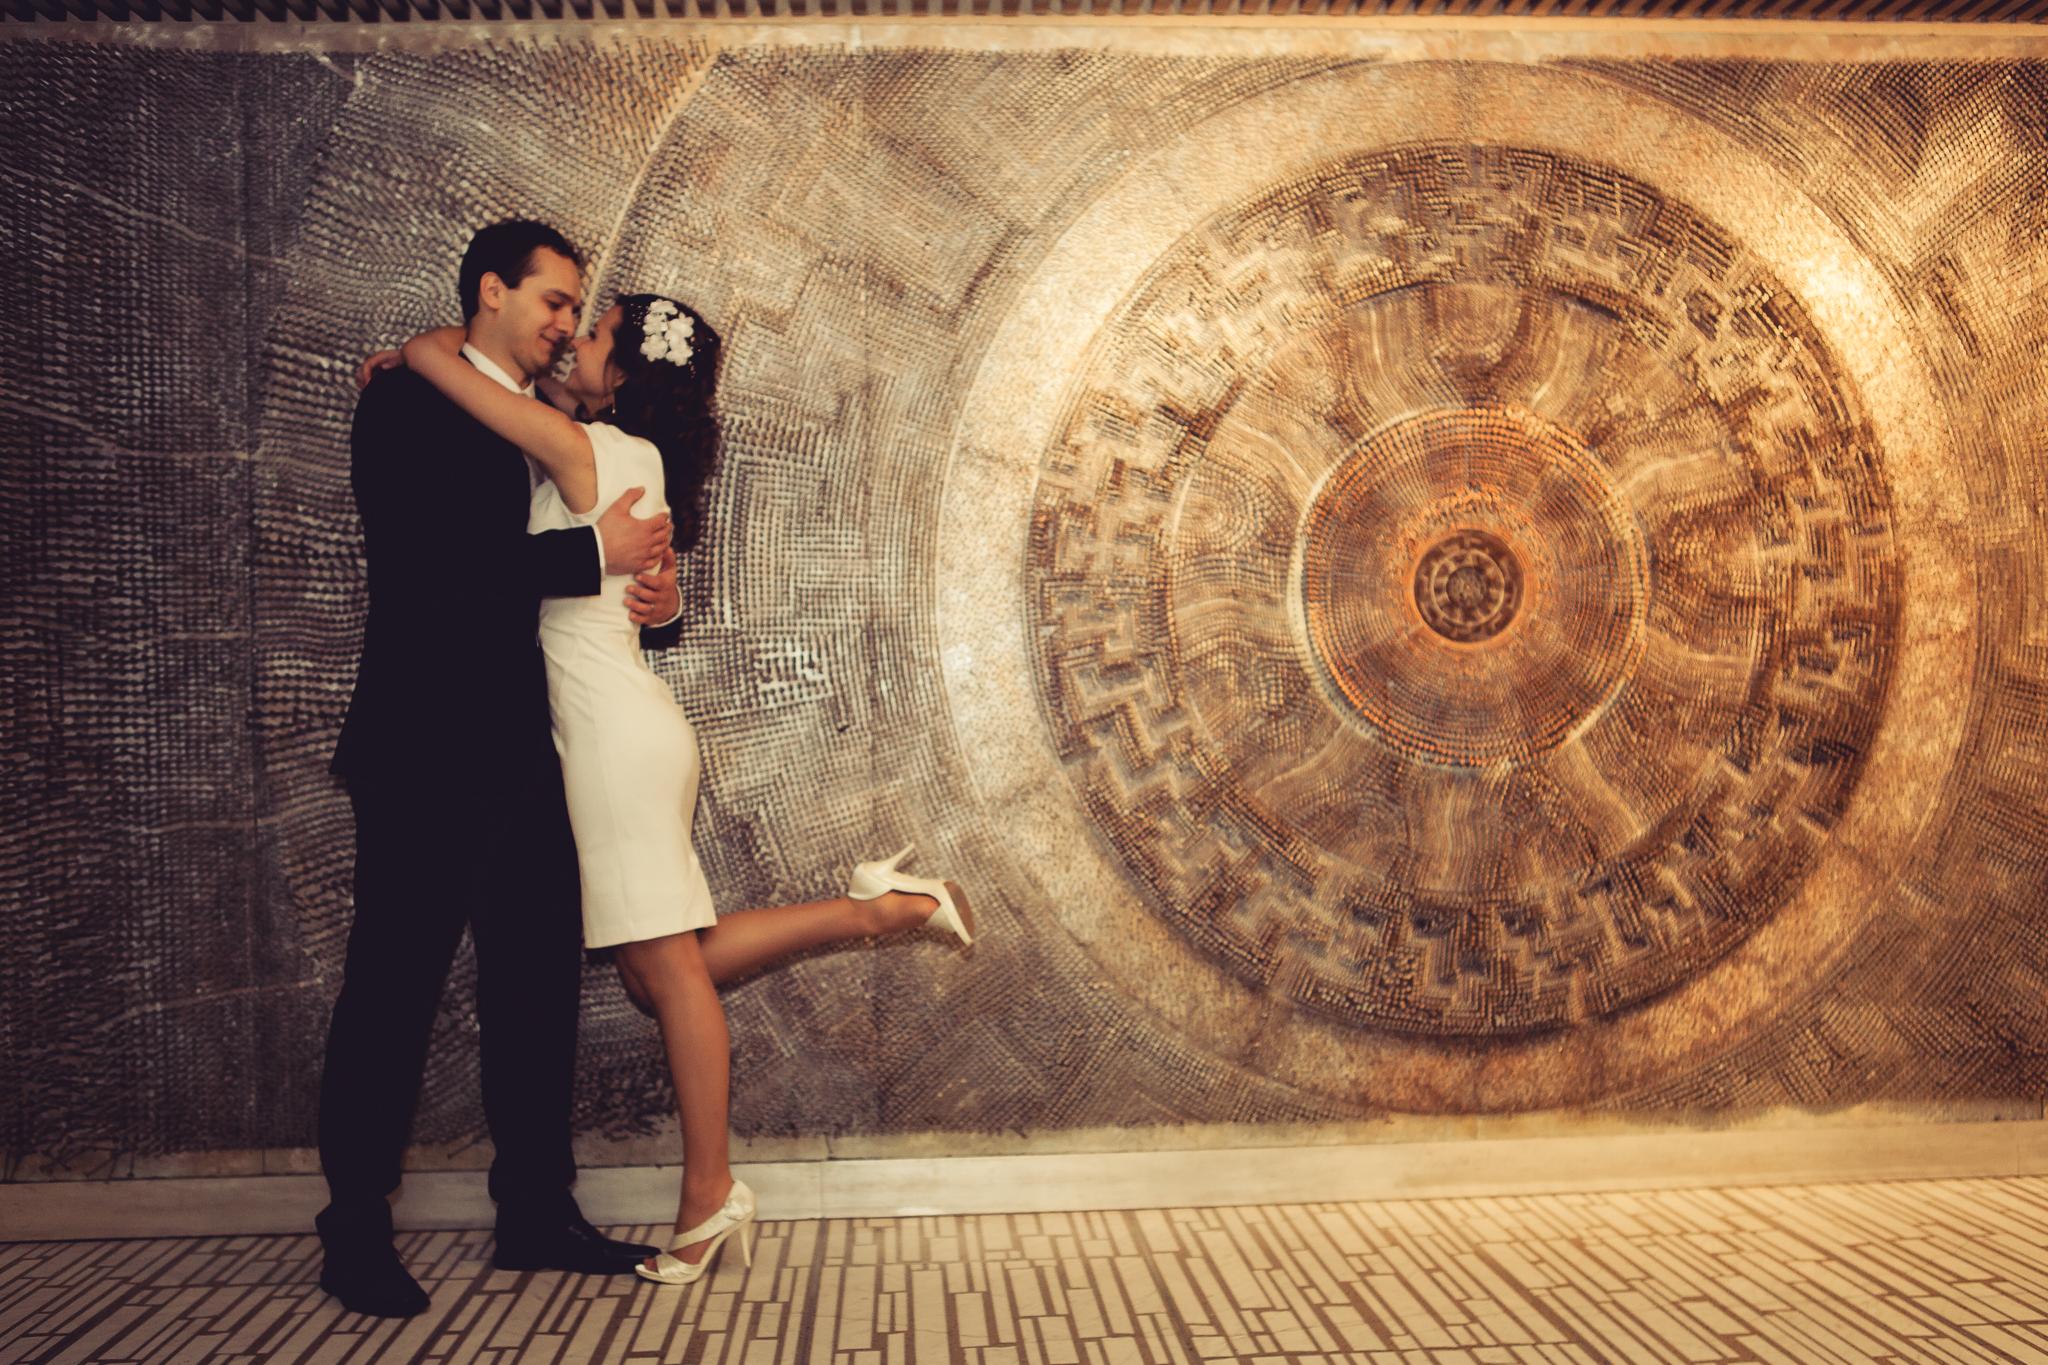 Toronto Wedding Photography - Zoya & Alexei -23.jpg